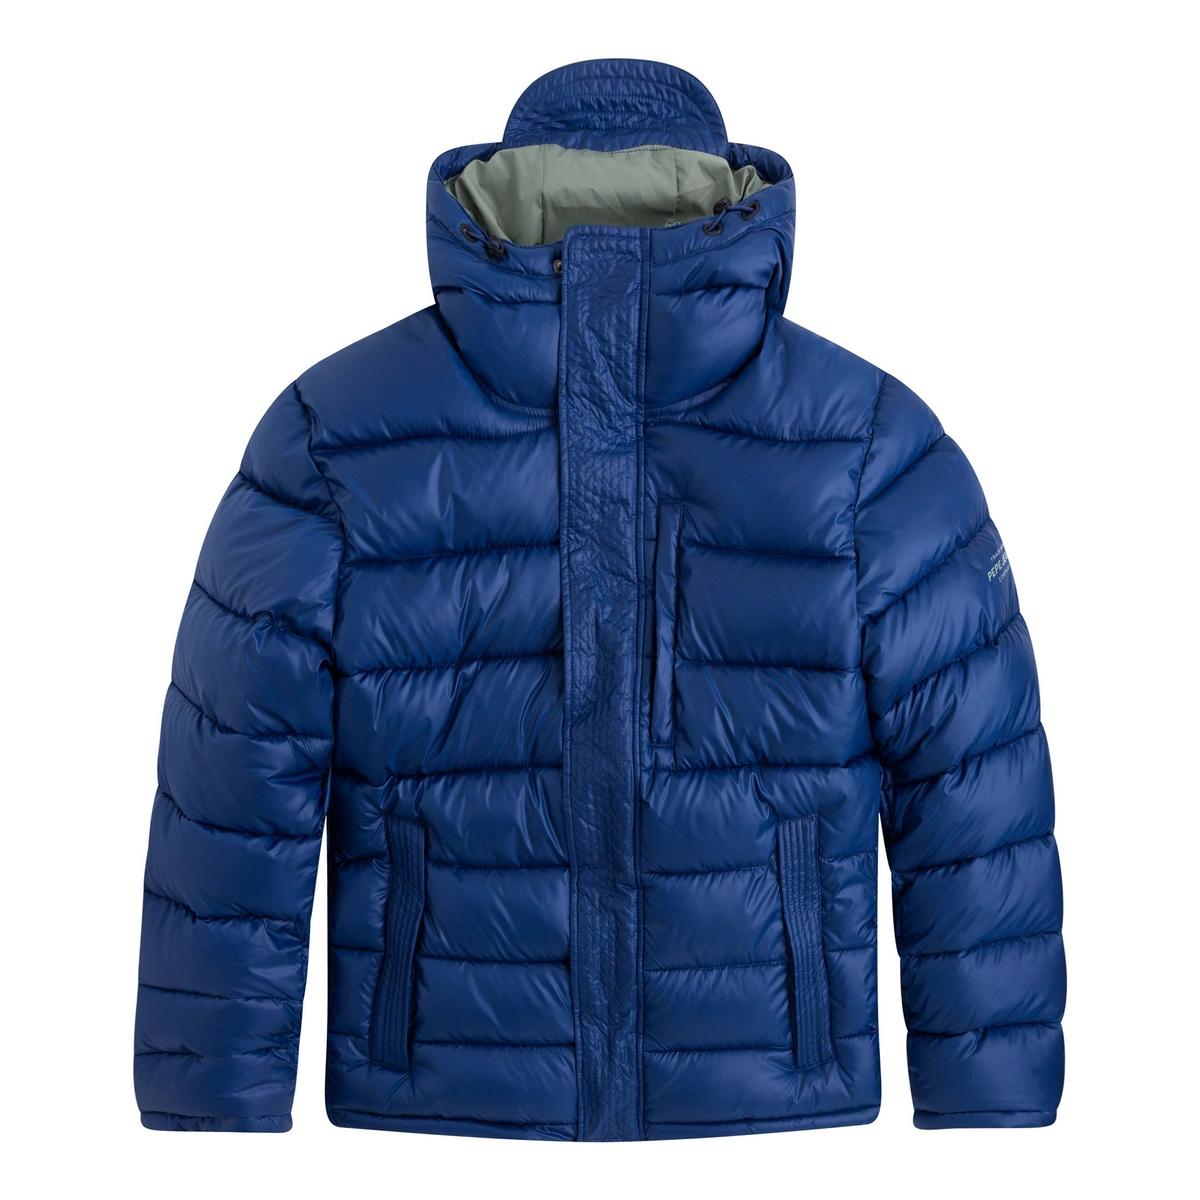 Куртка короткая с капюшоном WALLBROOKS короткая куртка artka wa10331c 2014